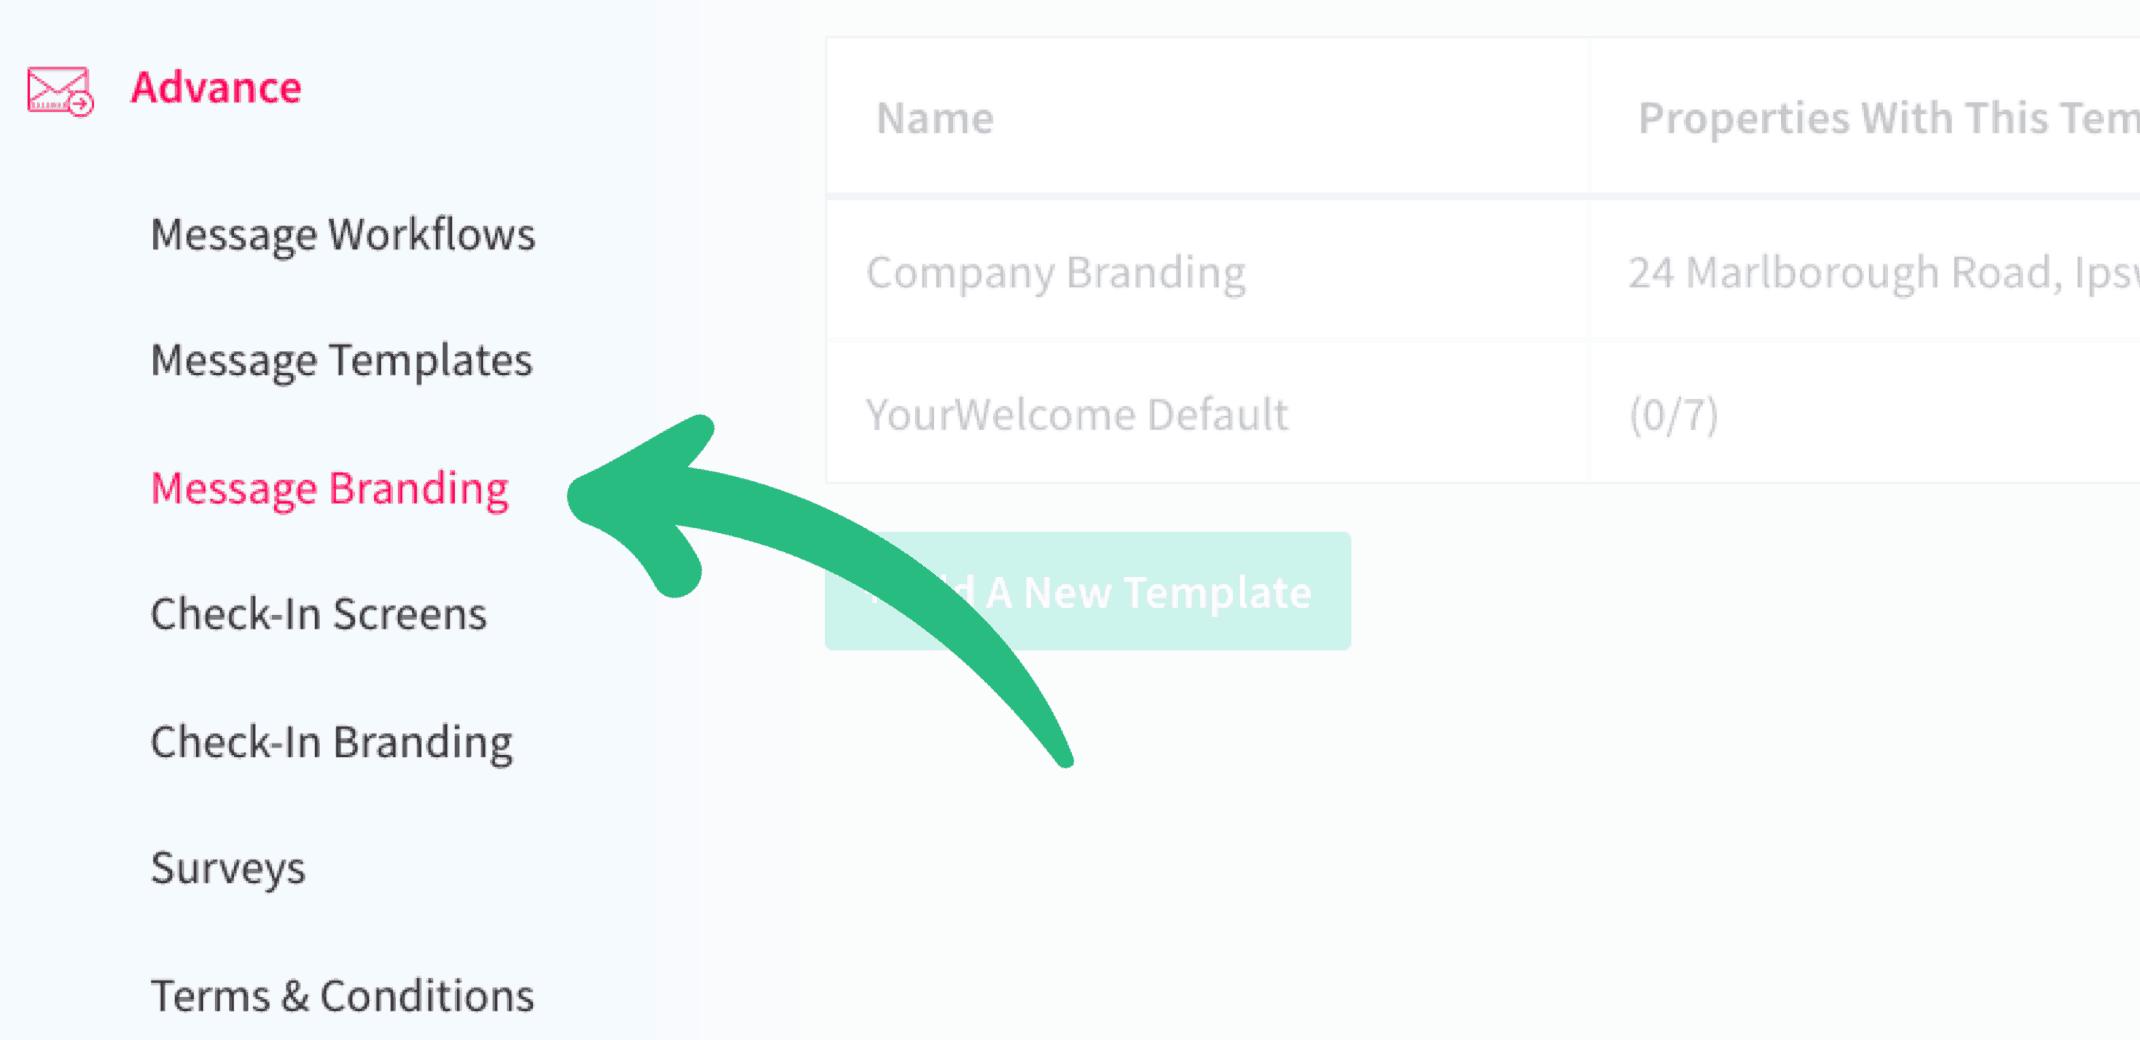 New branding template